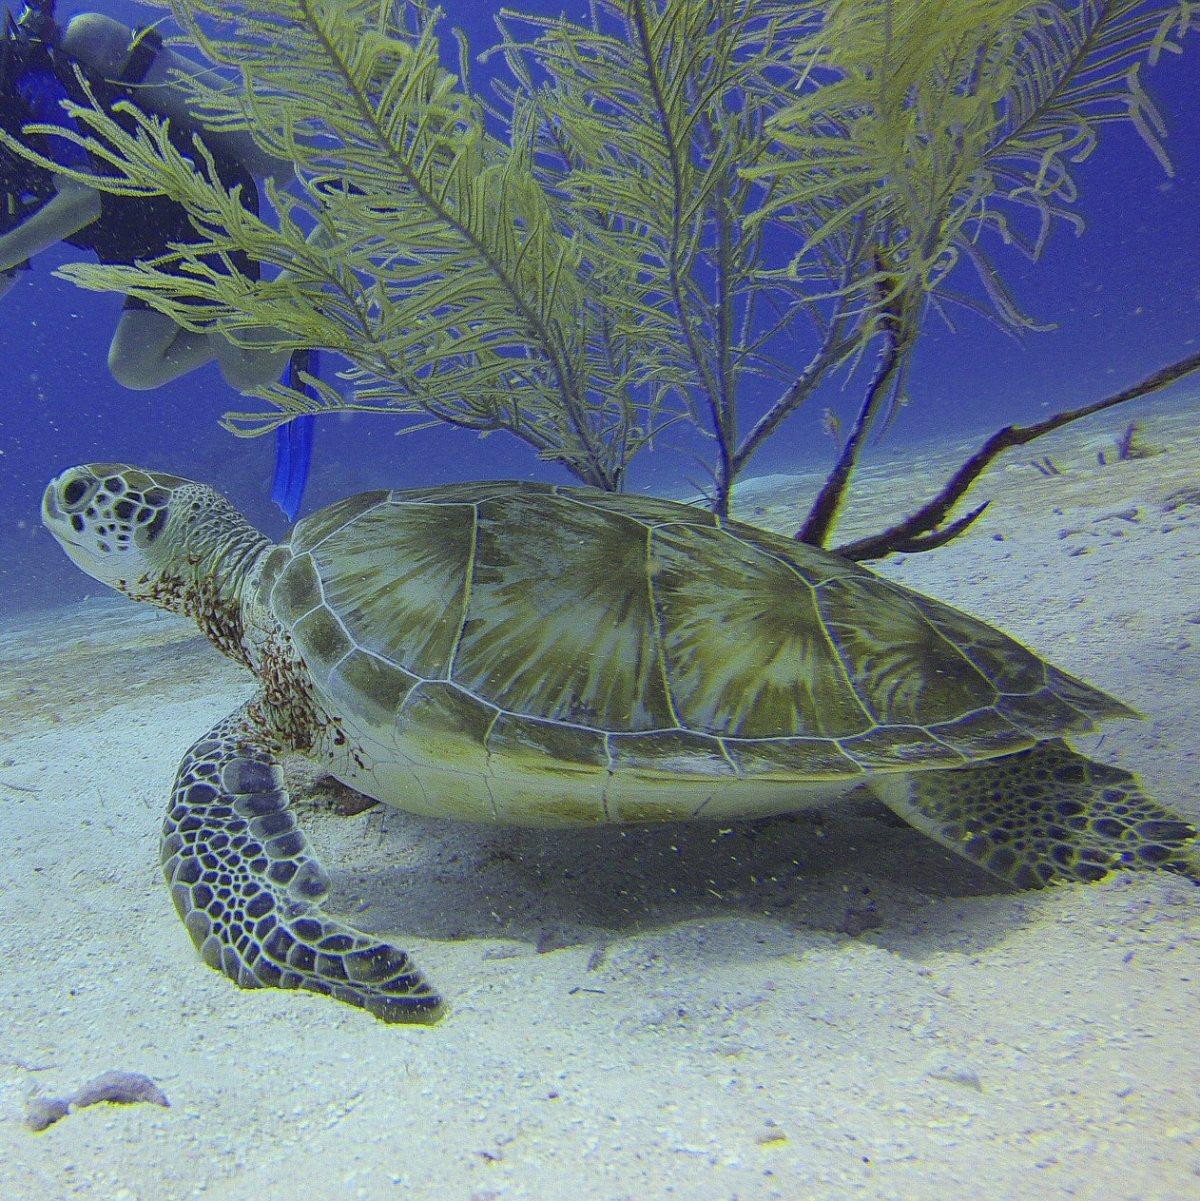 Sea Turtles, Mexico